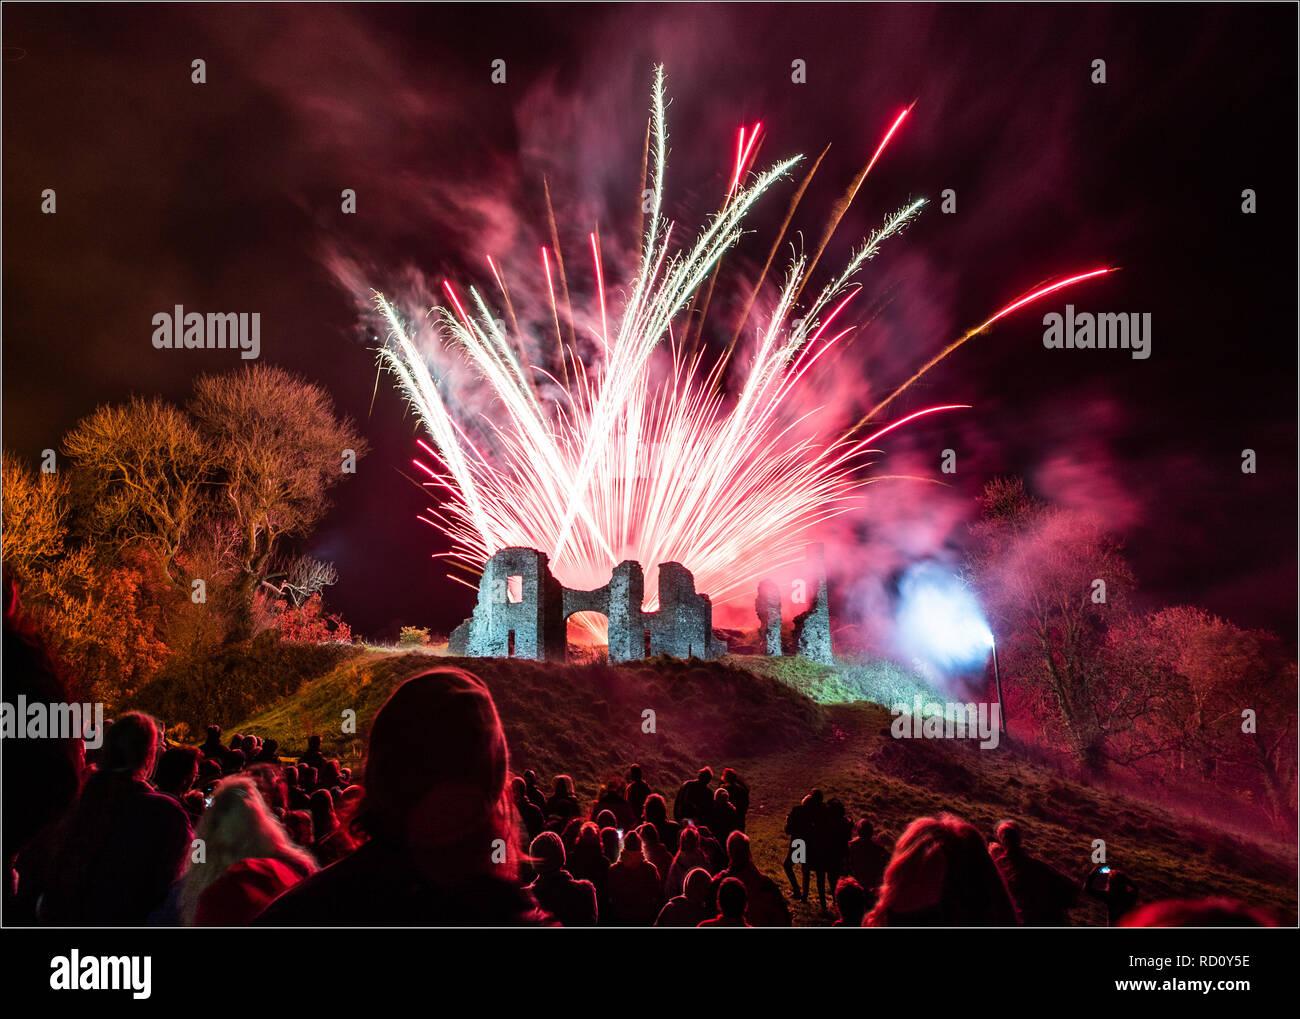 Fireworks display in Newcastle Emlyn, Carmarthenshire, Ceredigion, Wales.  Celebrating bonfire night in the UK - Stock Image